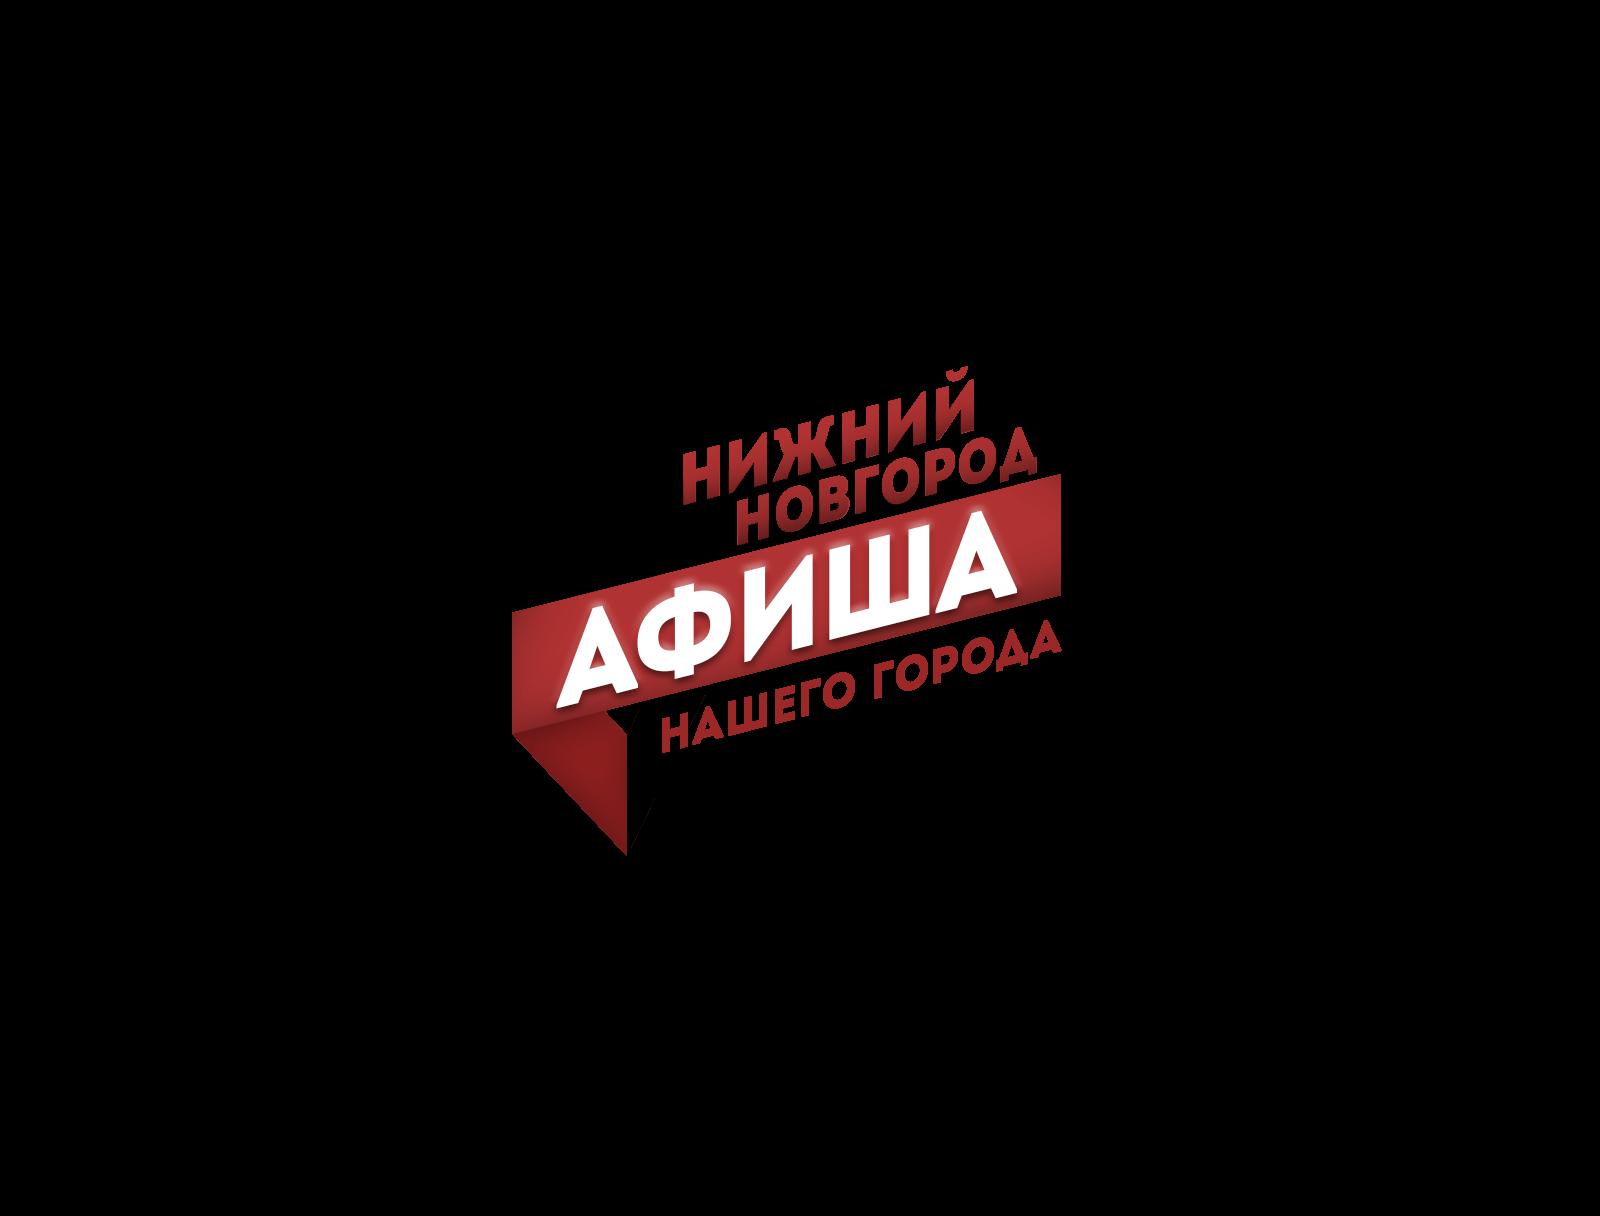 Интересный Нижний Новгород